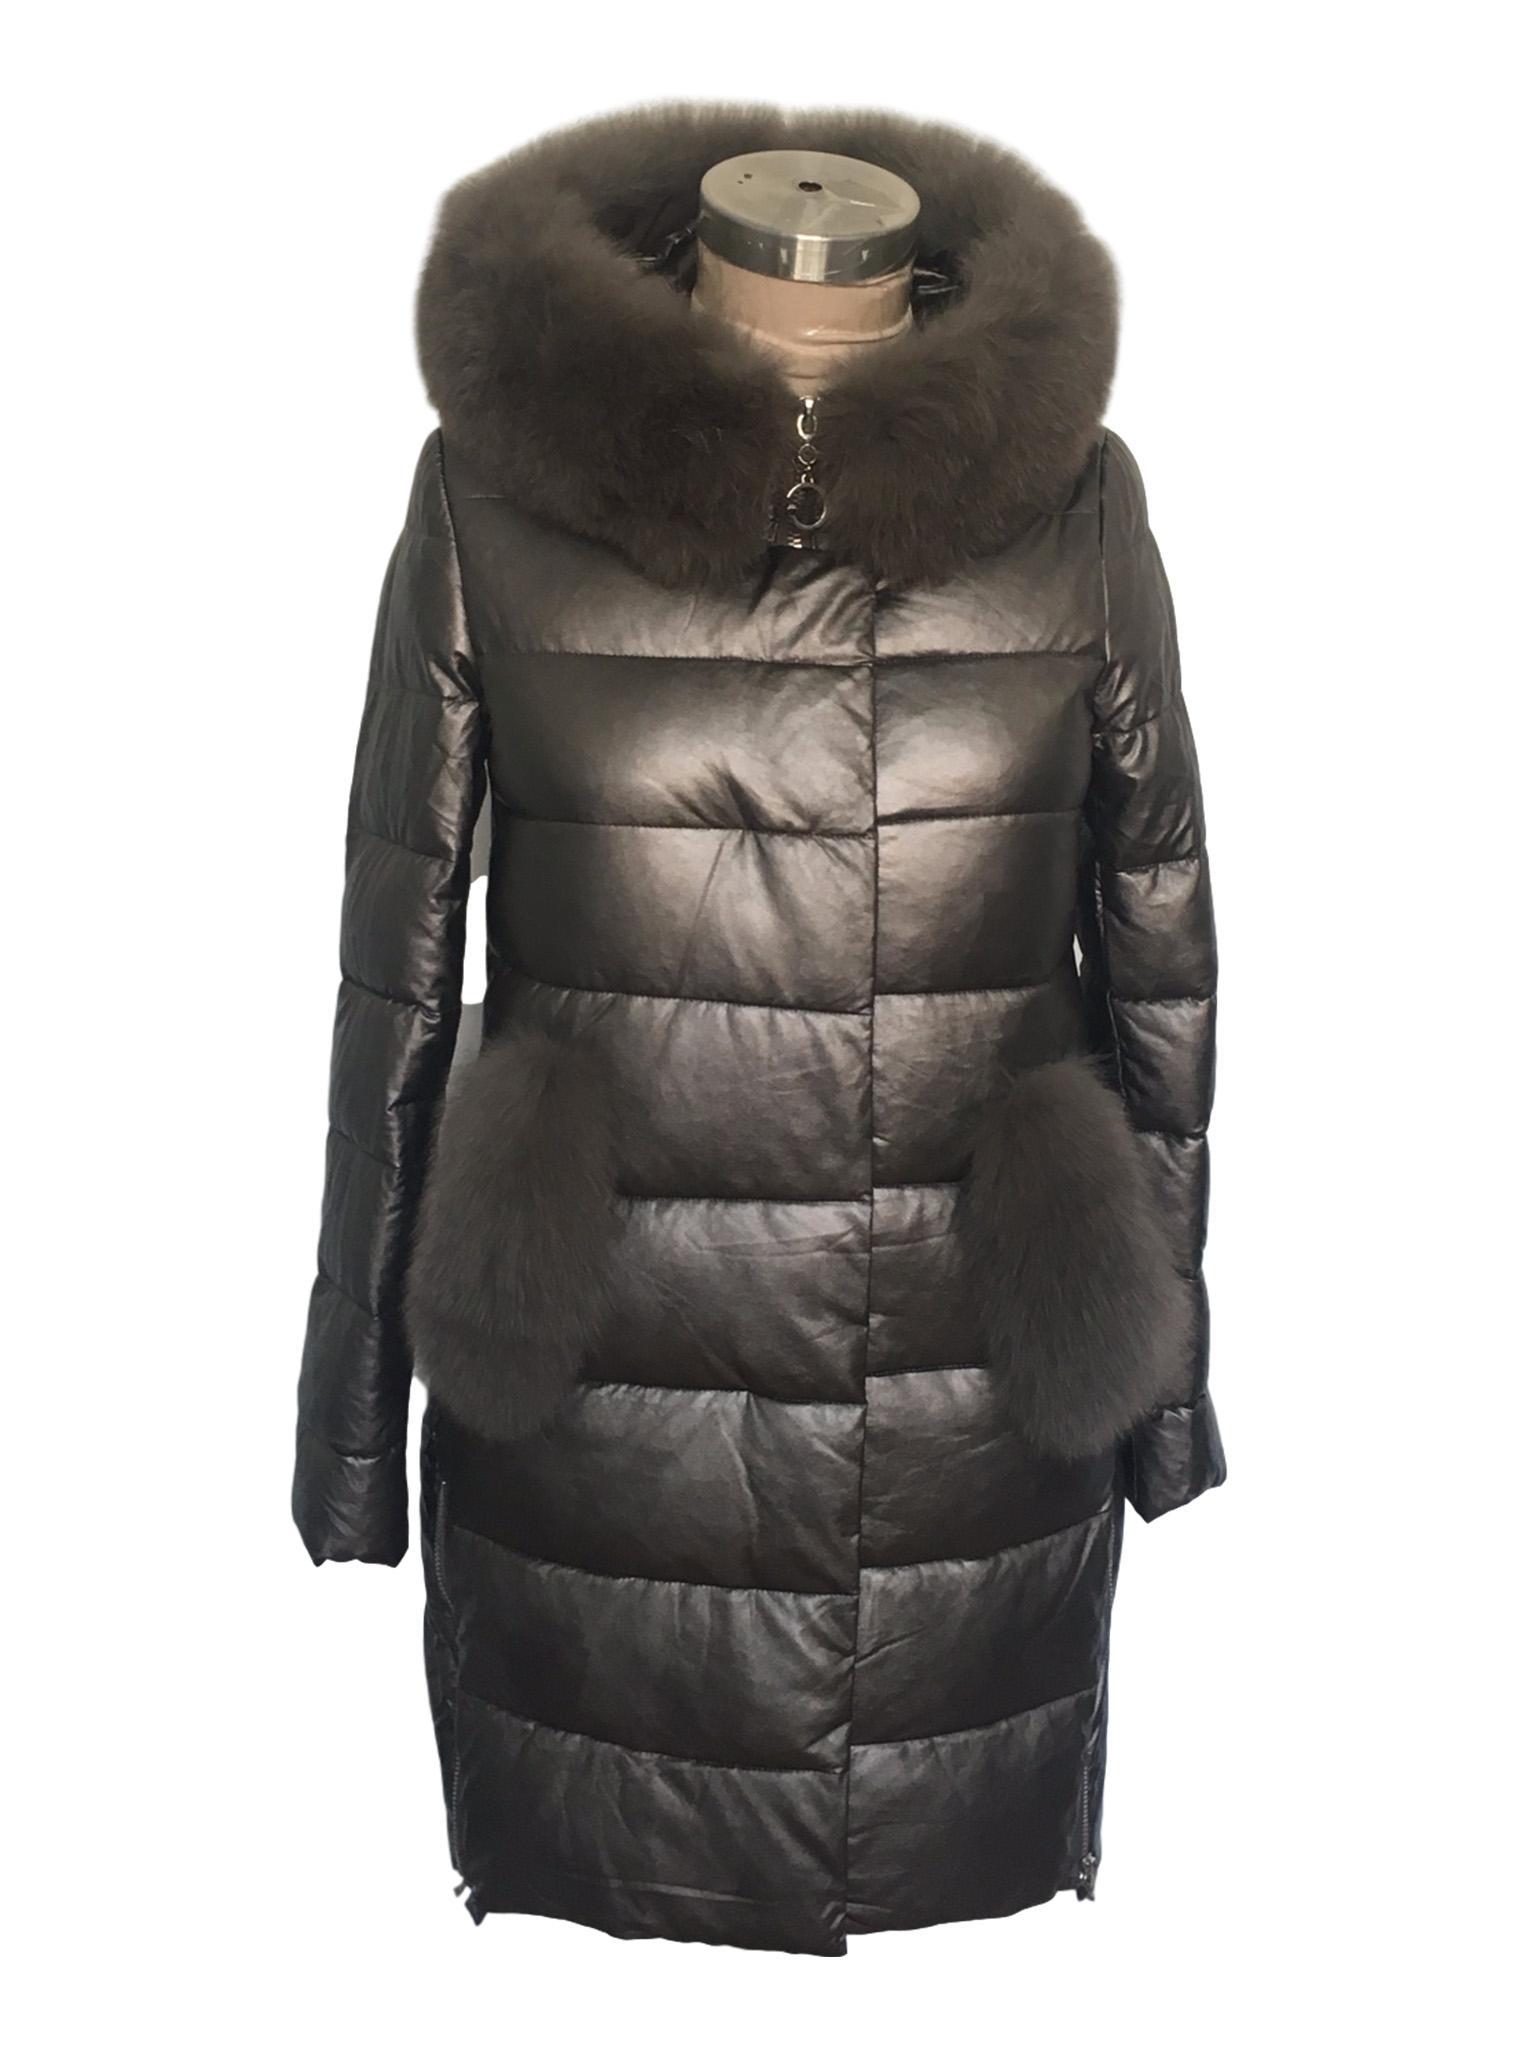 down jacket women,mens down jacket,down coat women,Huarui export